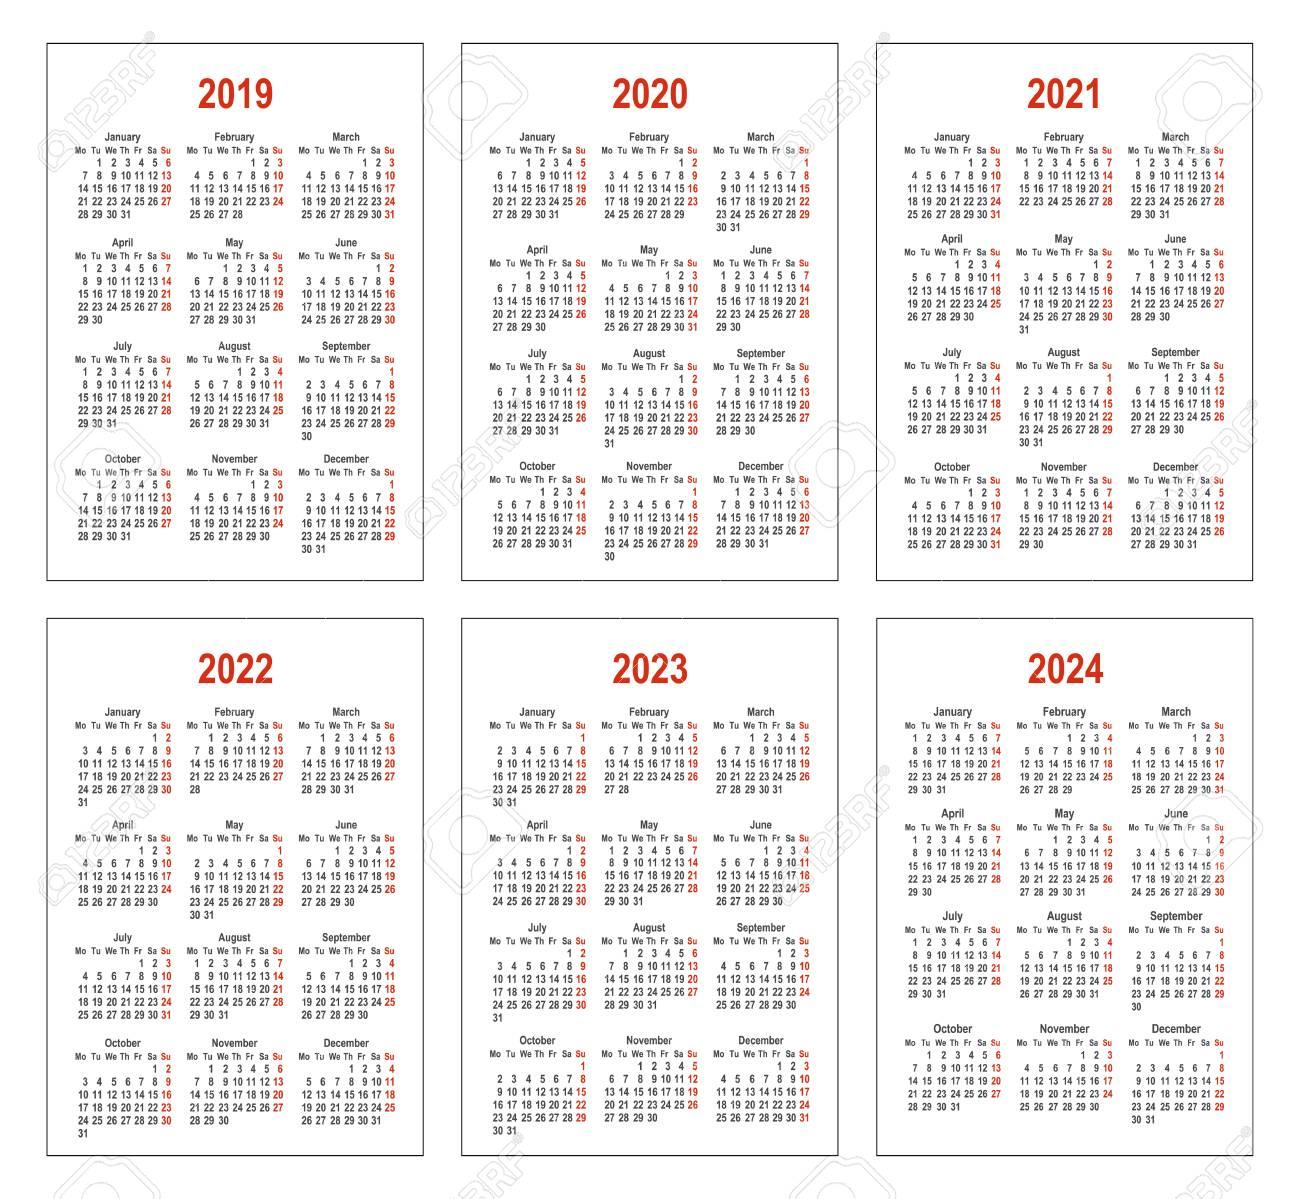 2022 2023 Pocket Calendar.Pocket Vertical Calendars Simple Calendar For 2019 2020 2021 Royalty Free Cliparts Vectors And Stock Illustration Image 115839603